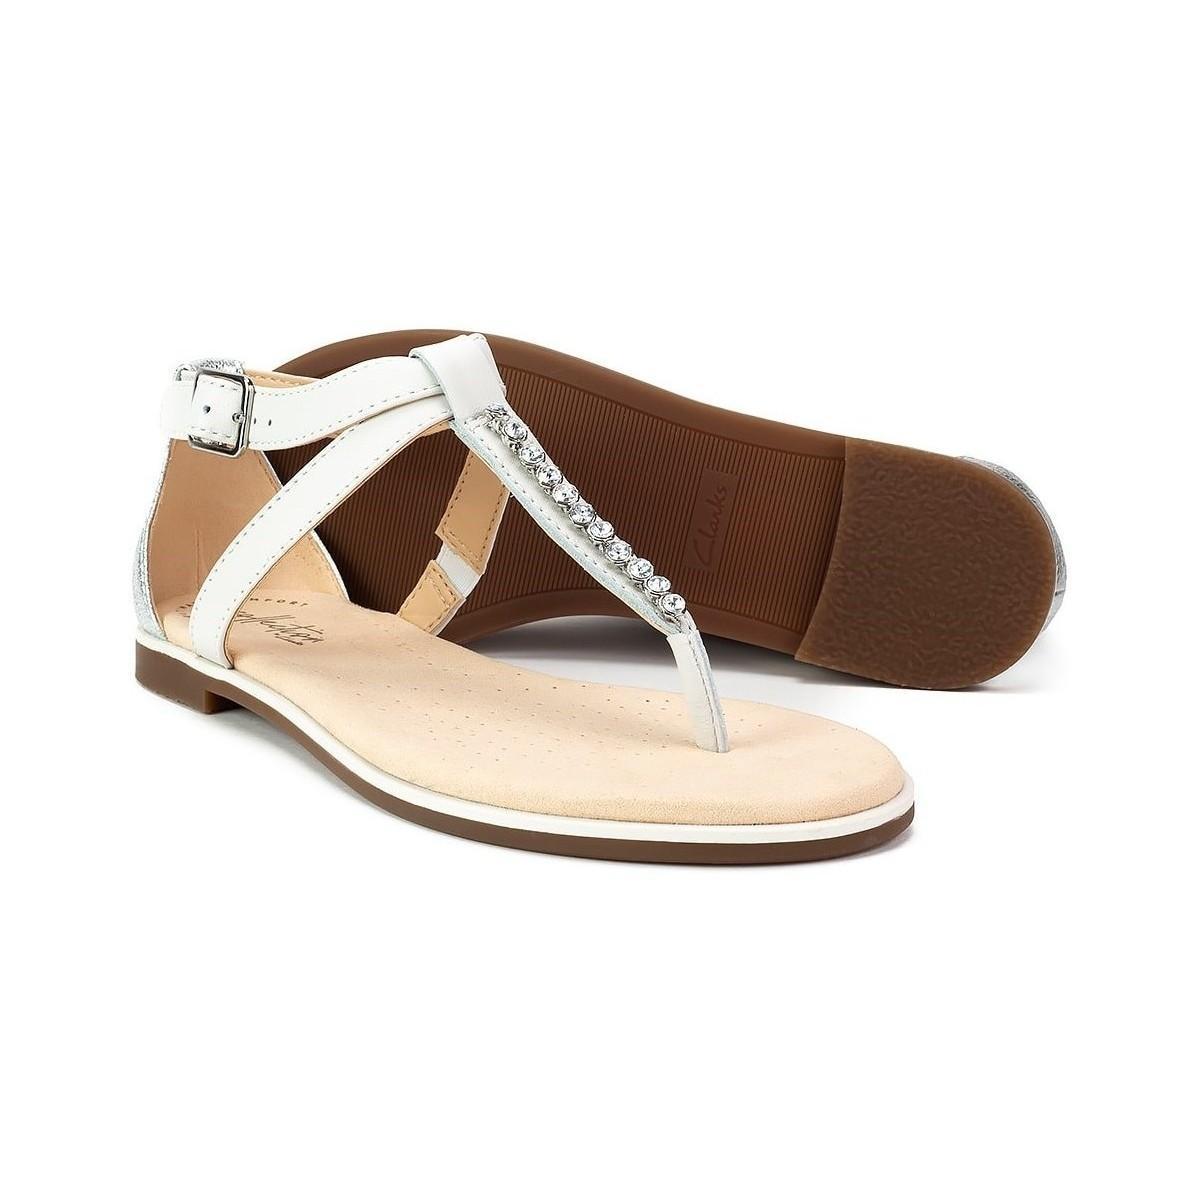 4452cb20f615 Clarks Bay Poppy Women s Sandals In White in White - Lyst